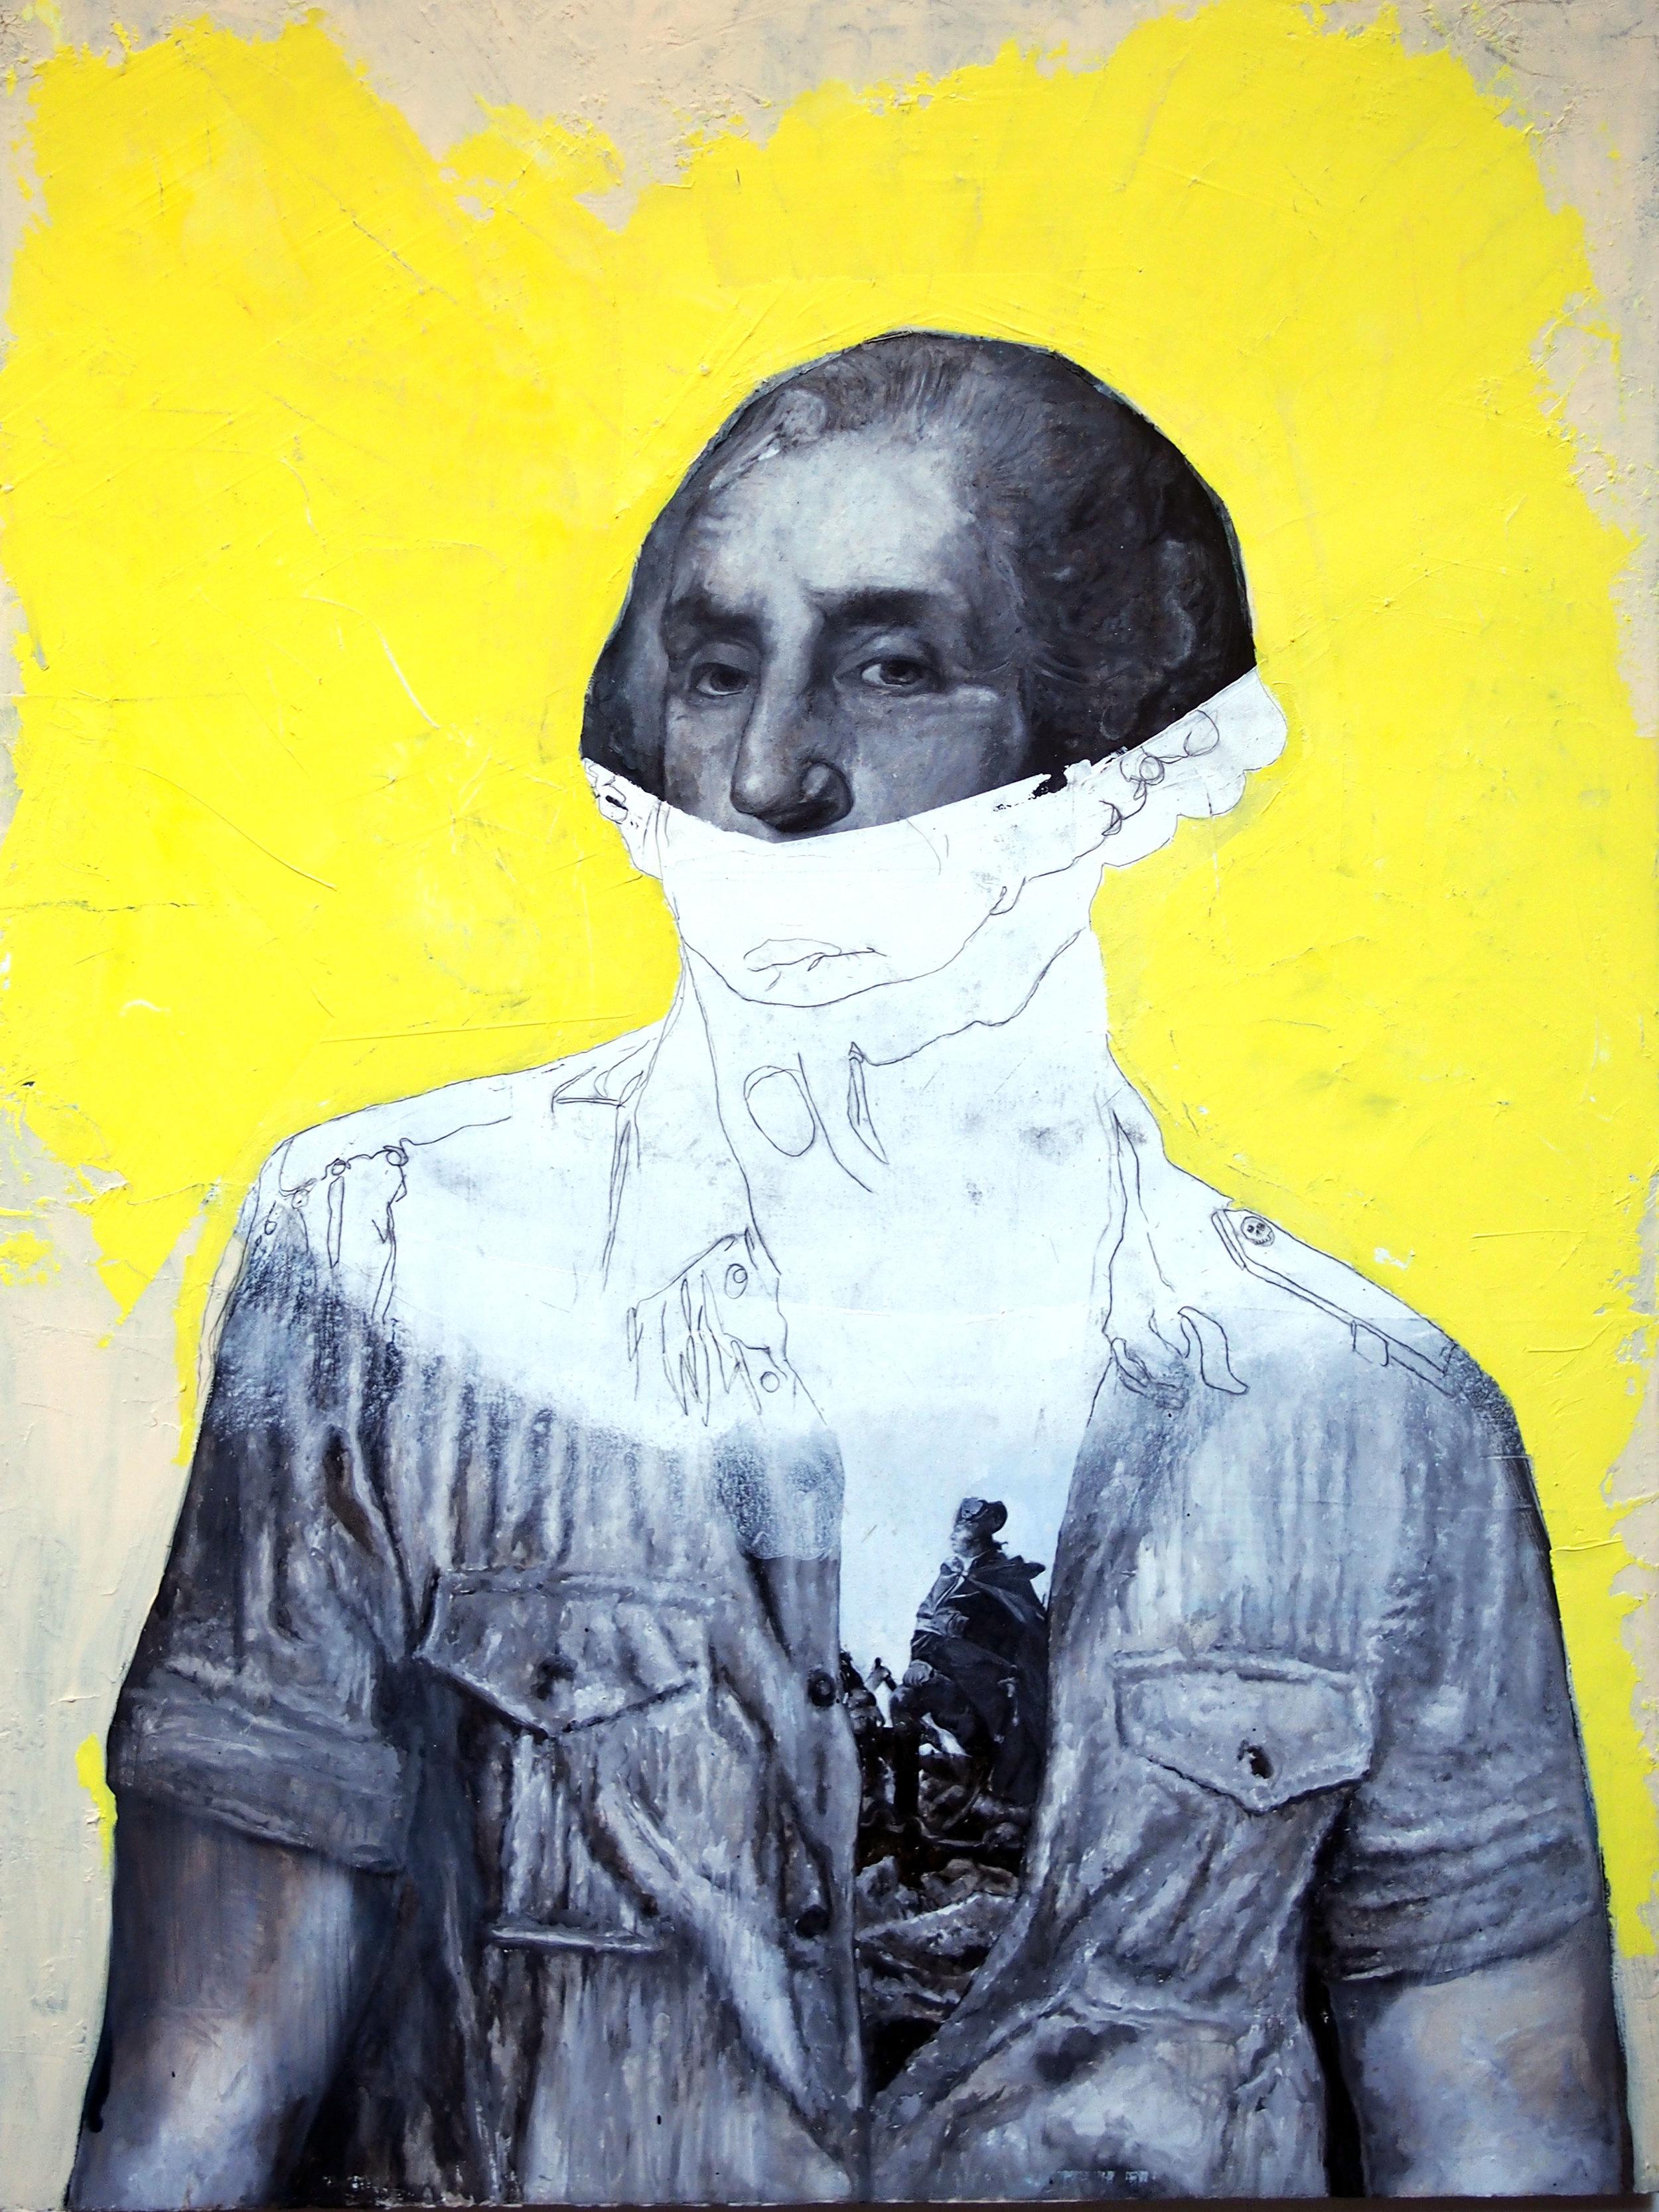 george washington yellow joker painting